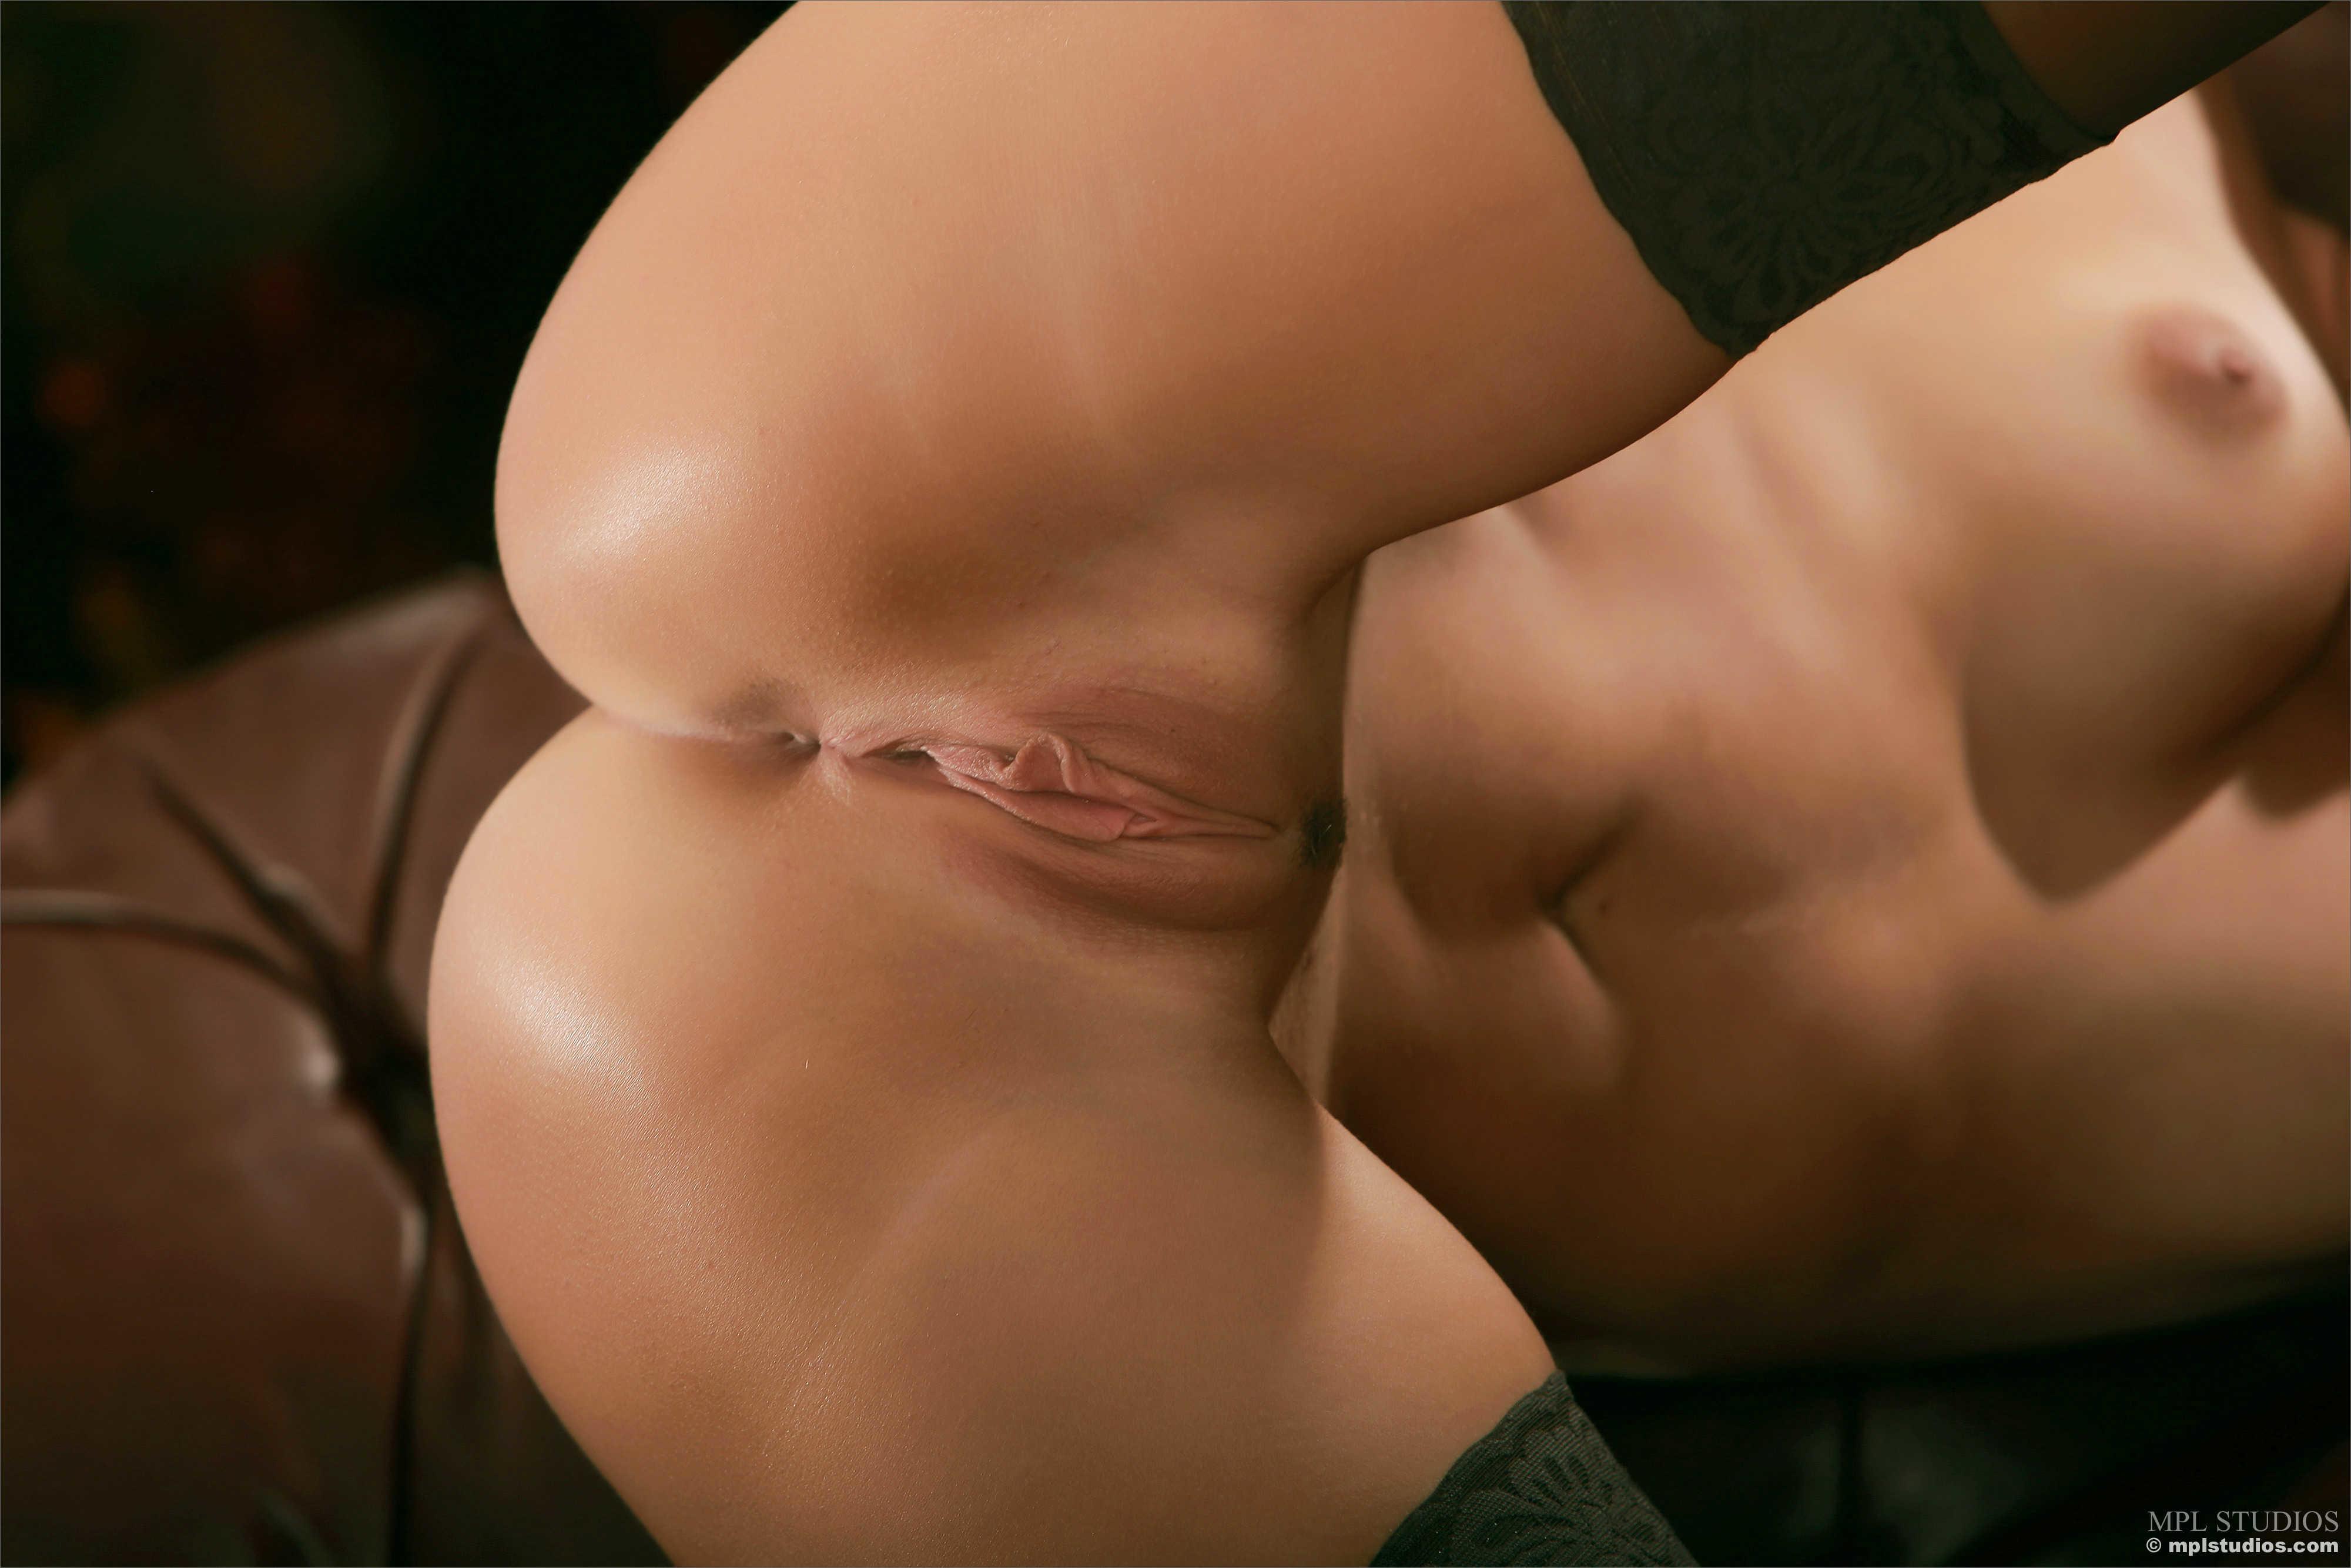 Rimi sen naked fucking photo